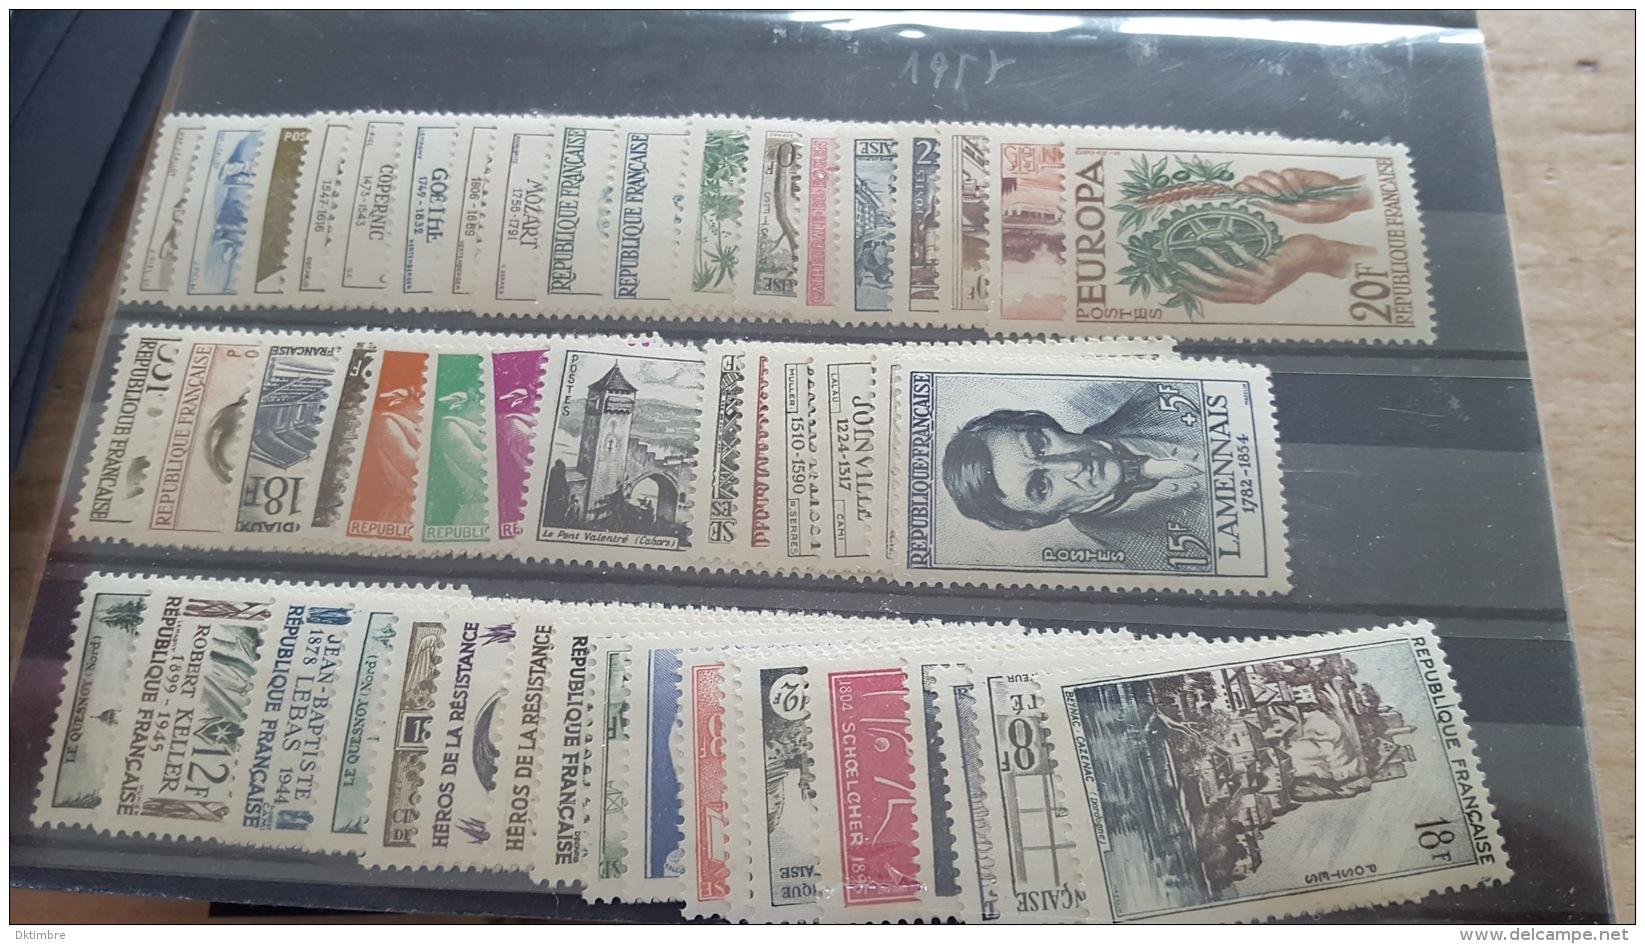 LOT 362805 TIMBRE DE FRANCE NEUF** ANNEE 1957 DEPART A 1€ - ....-1939